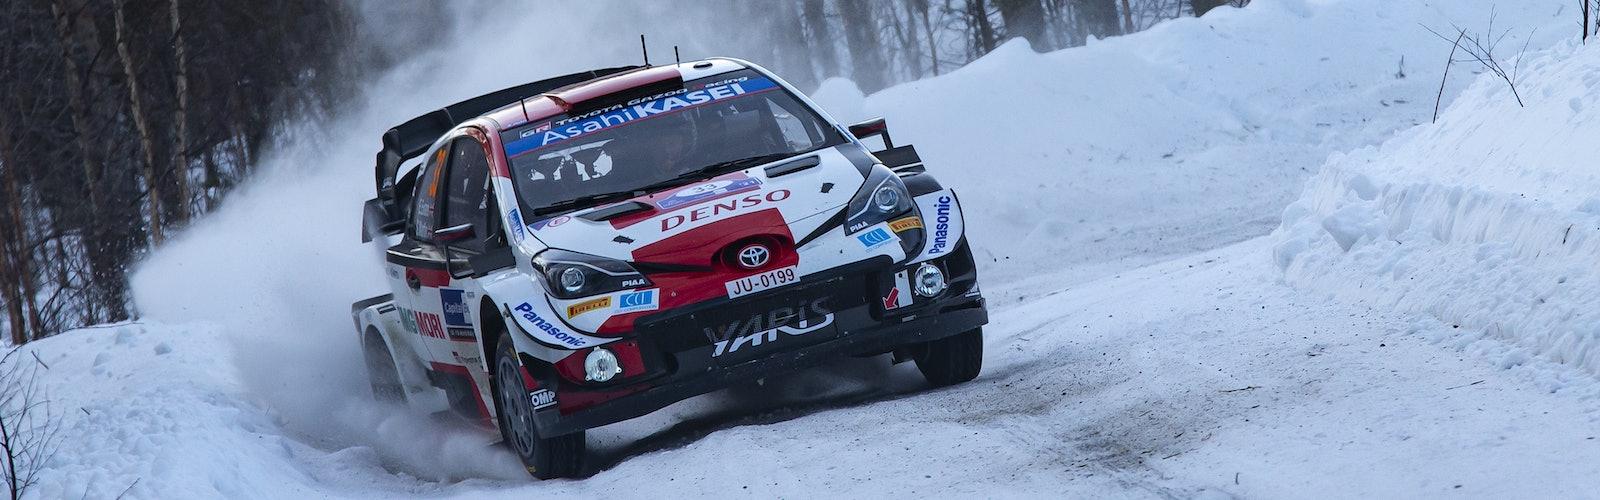 WRC_2021_Rd2._170